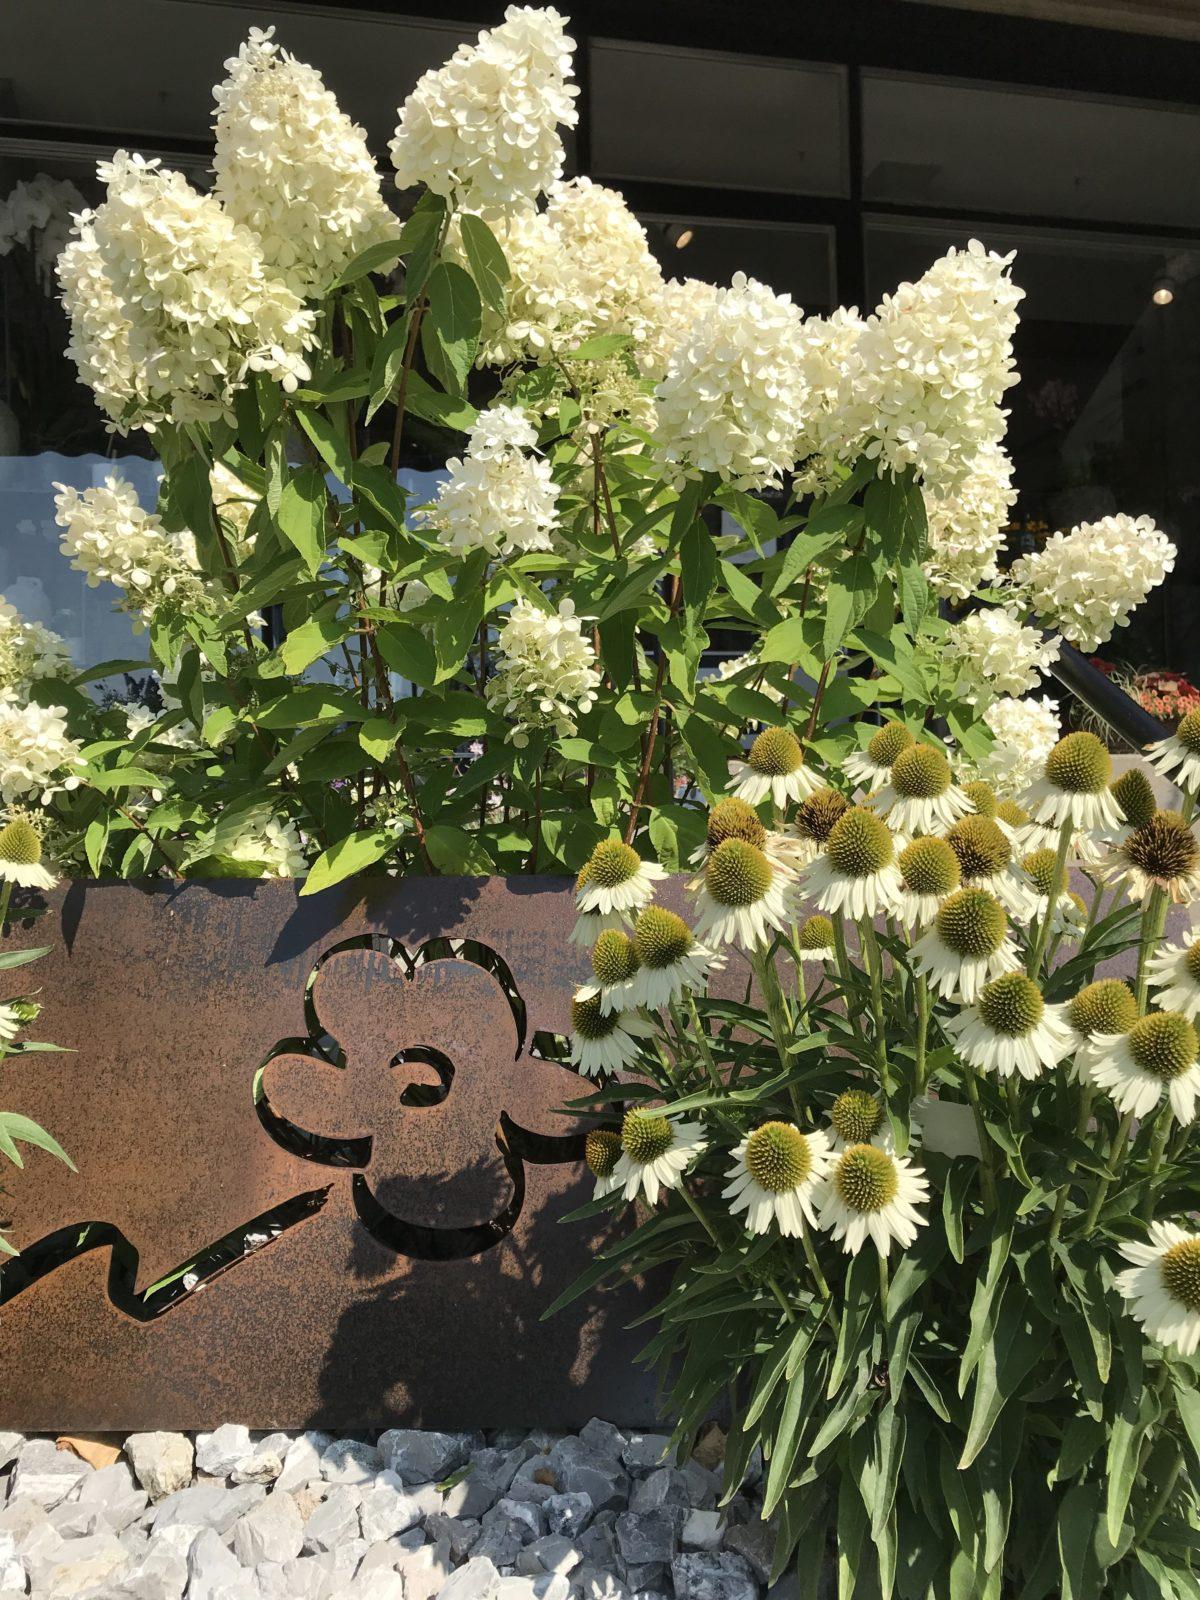 Fleurs Cornut - Av. de Channel 1 - Morges